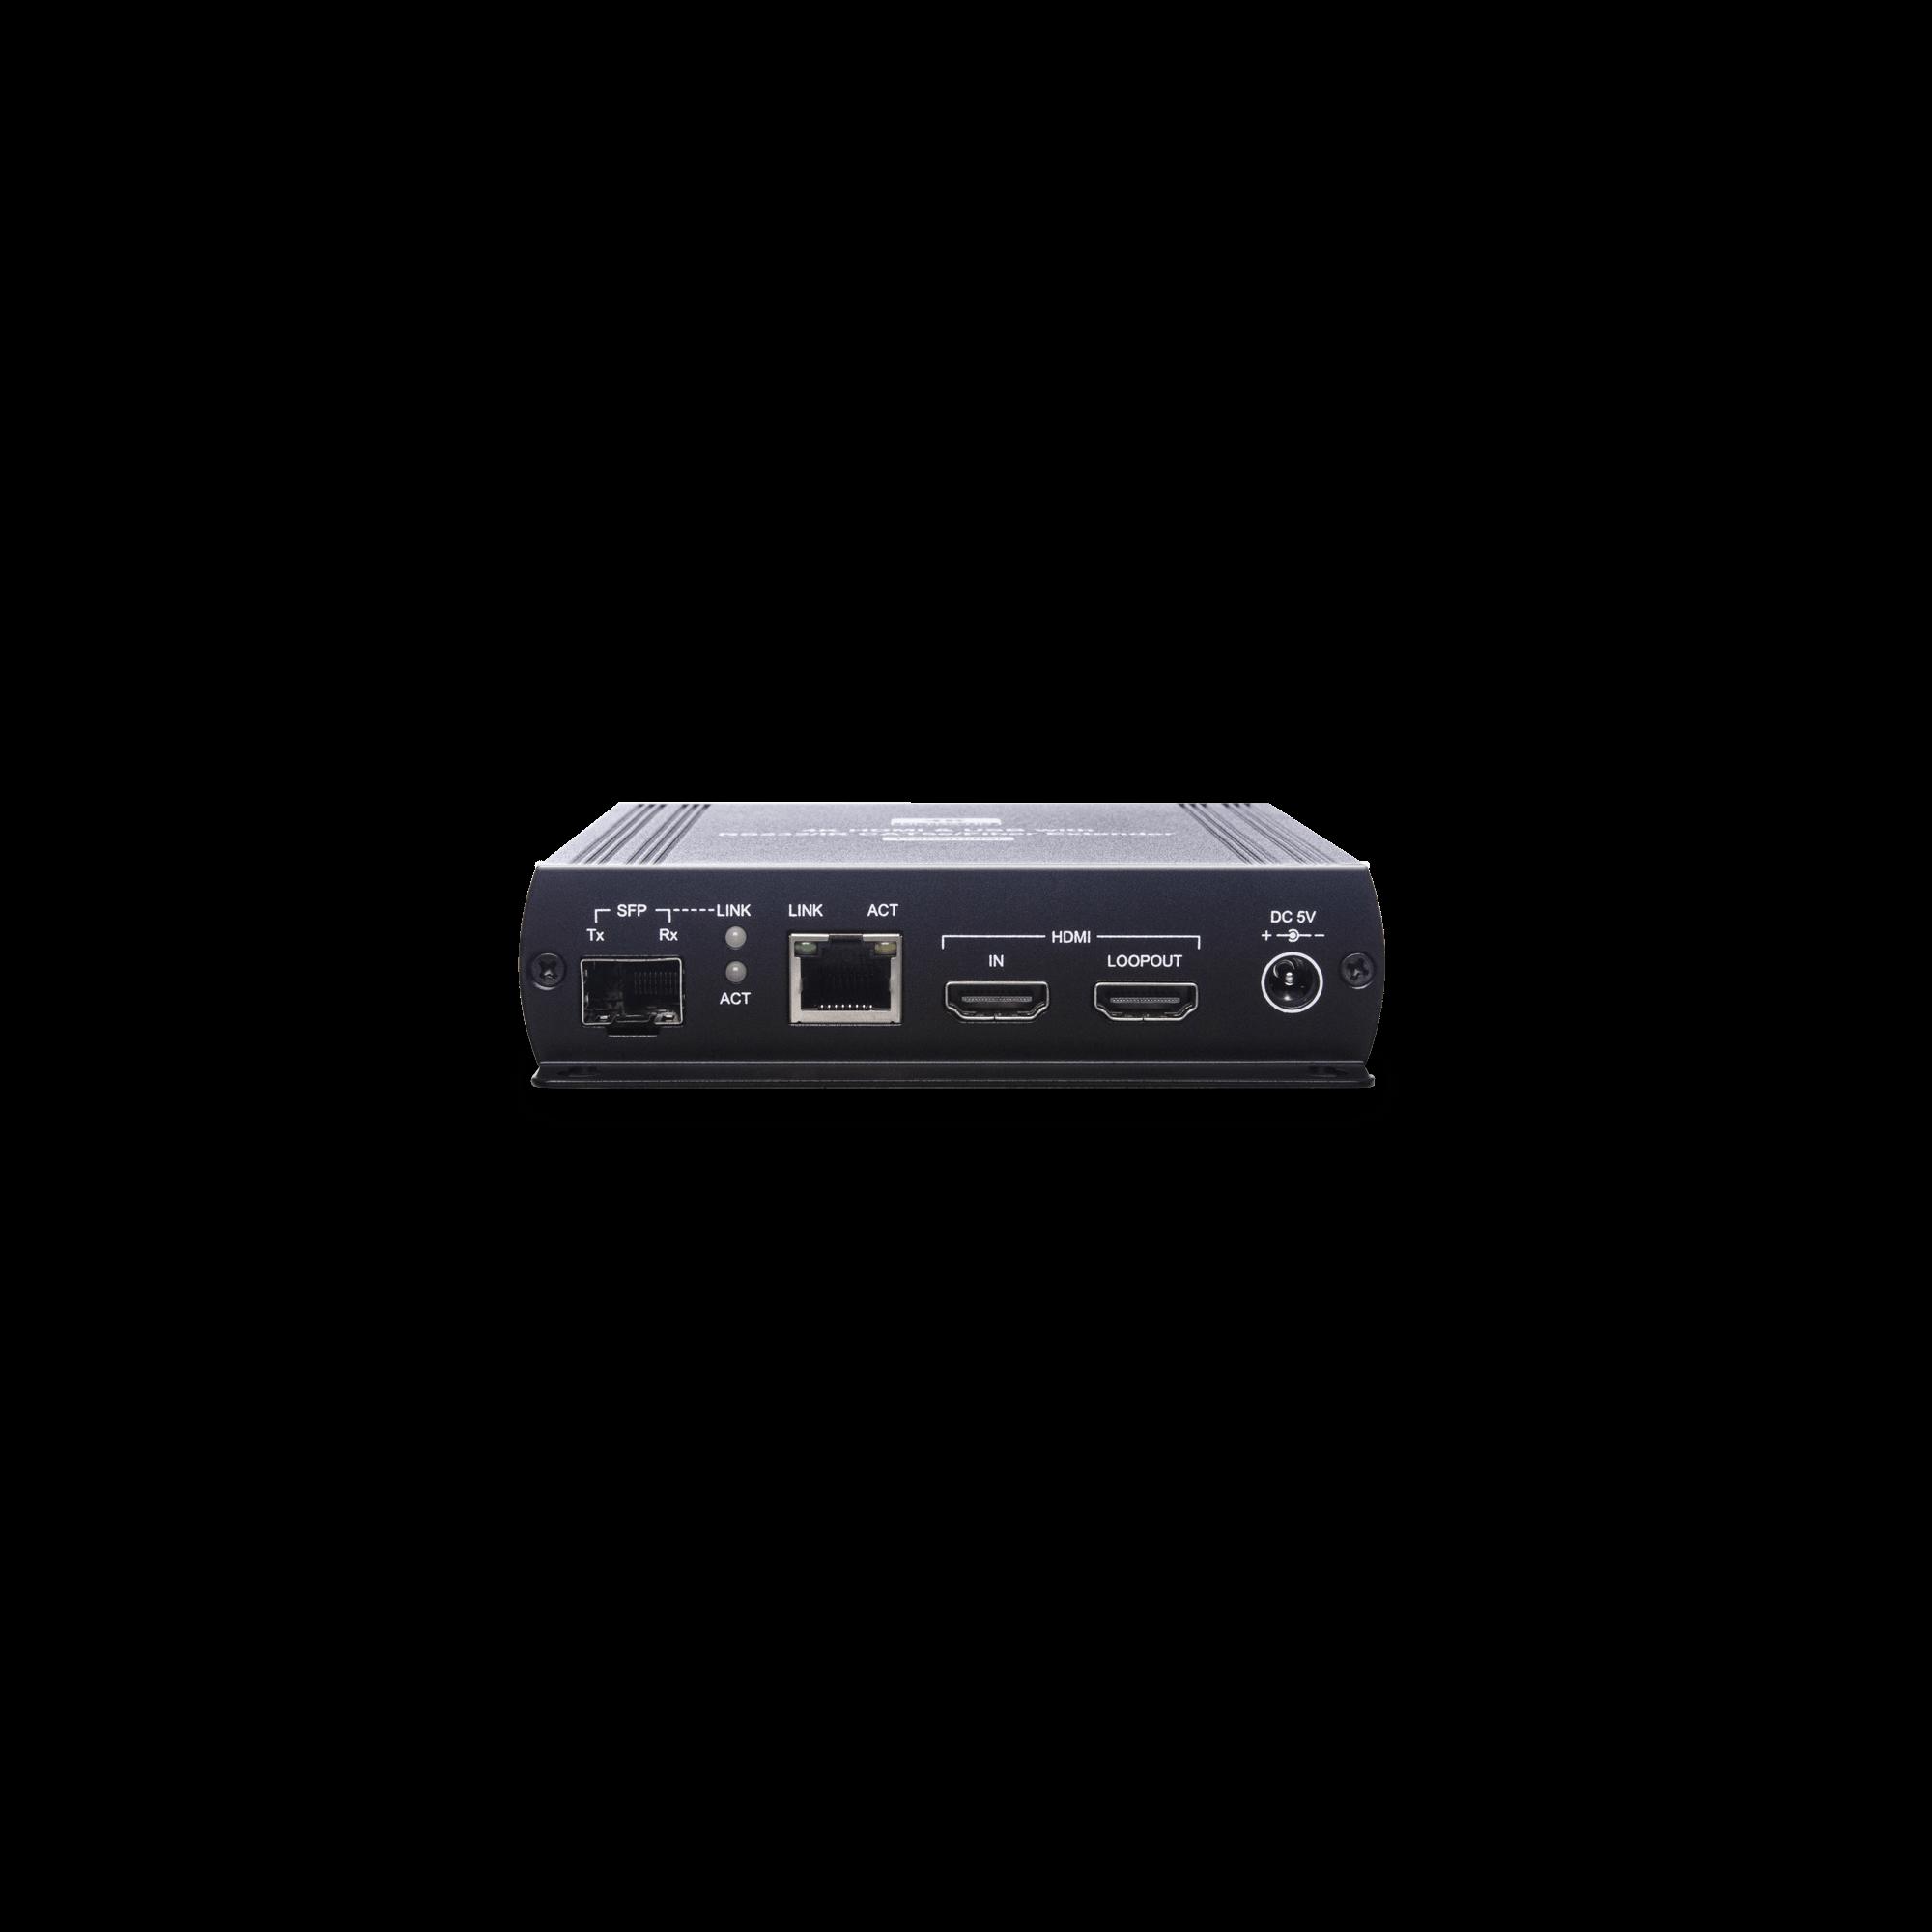 4K HDMI USB/Audio/RS232/IR CAT5e KVM Extender 140M with Fiber